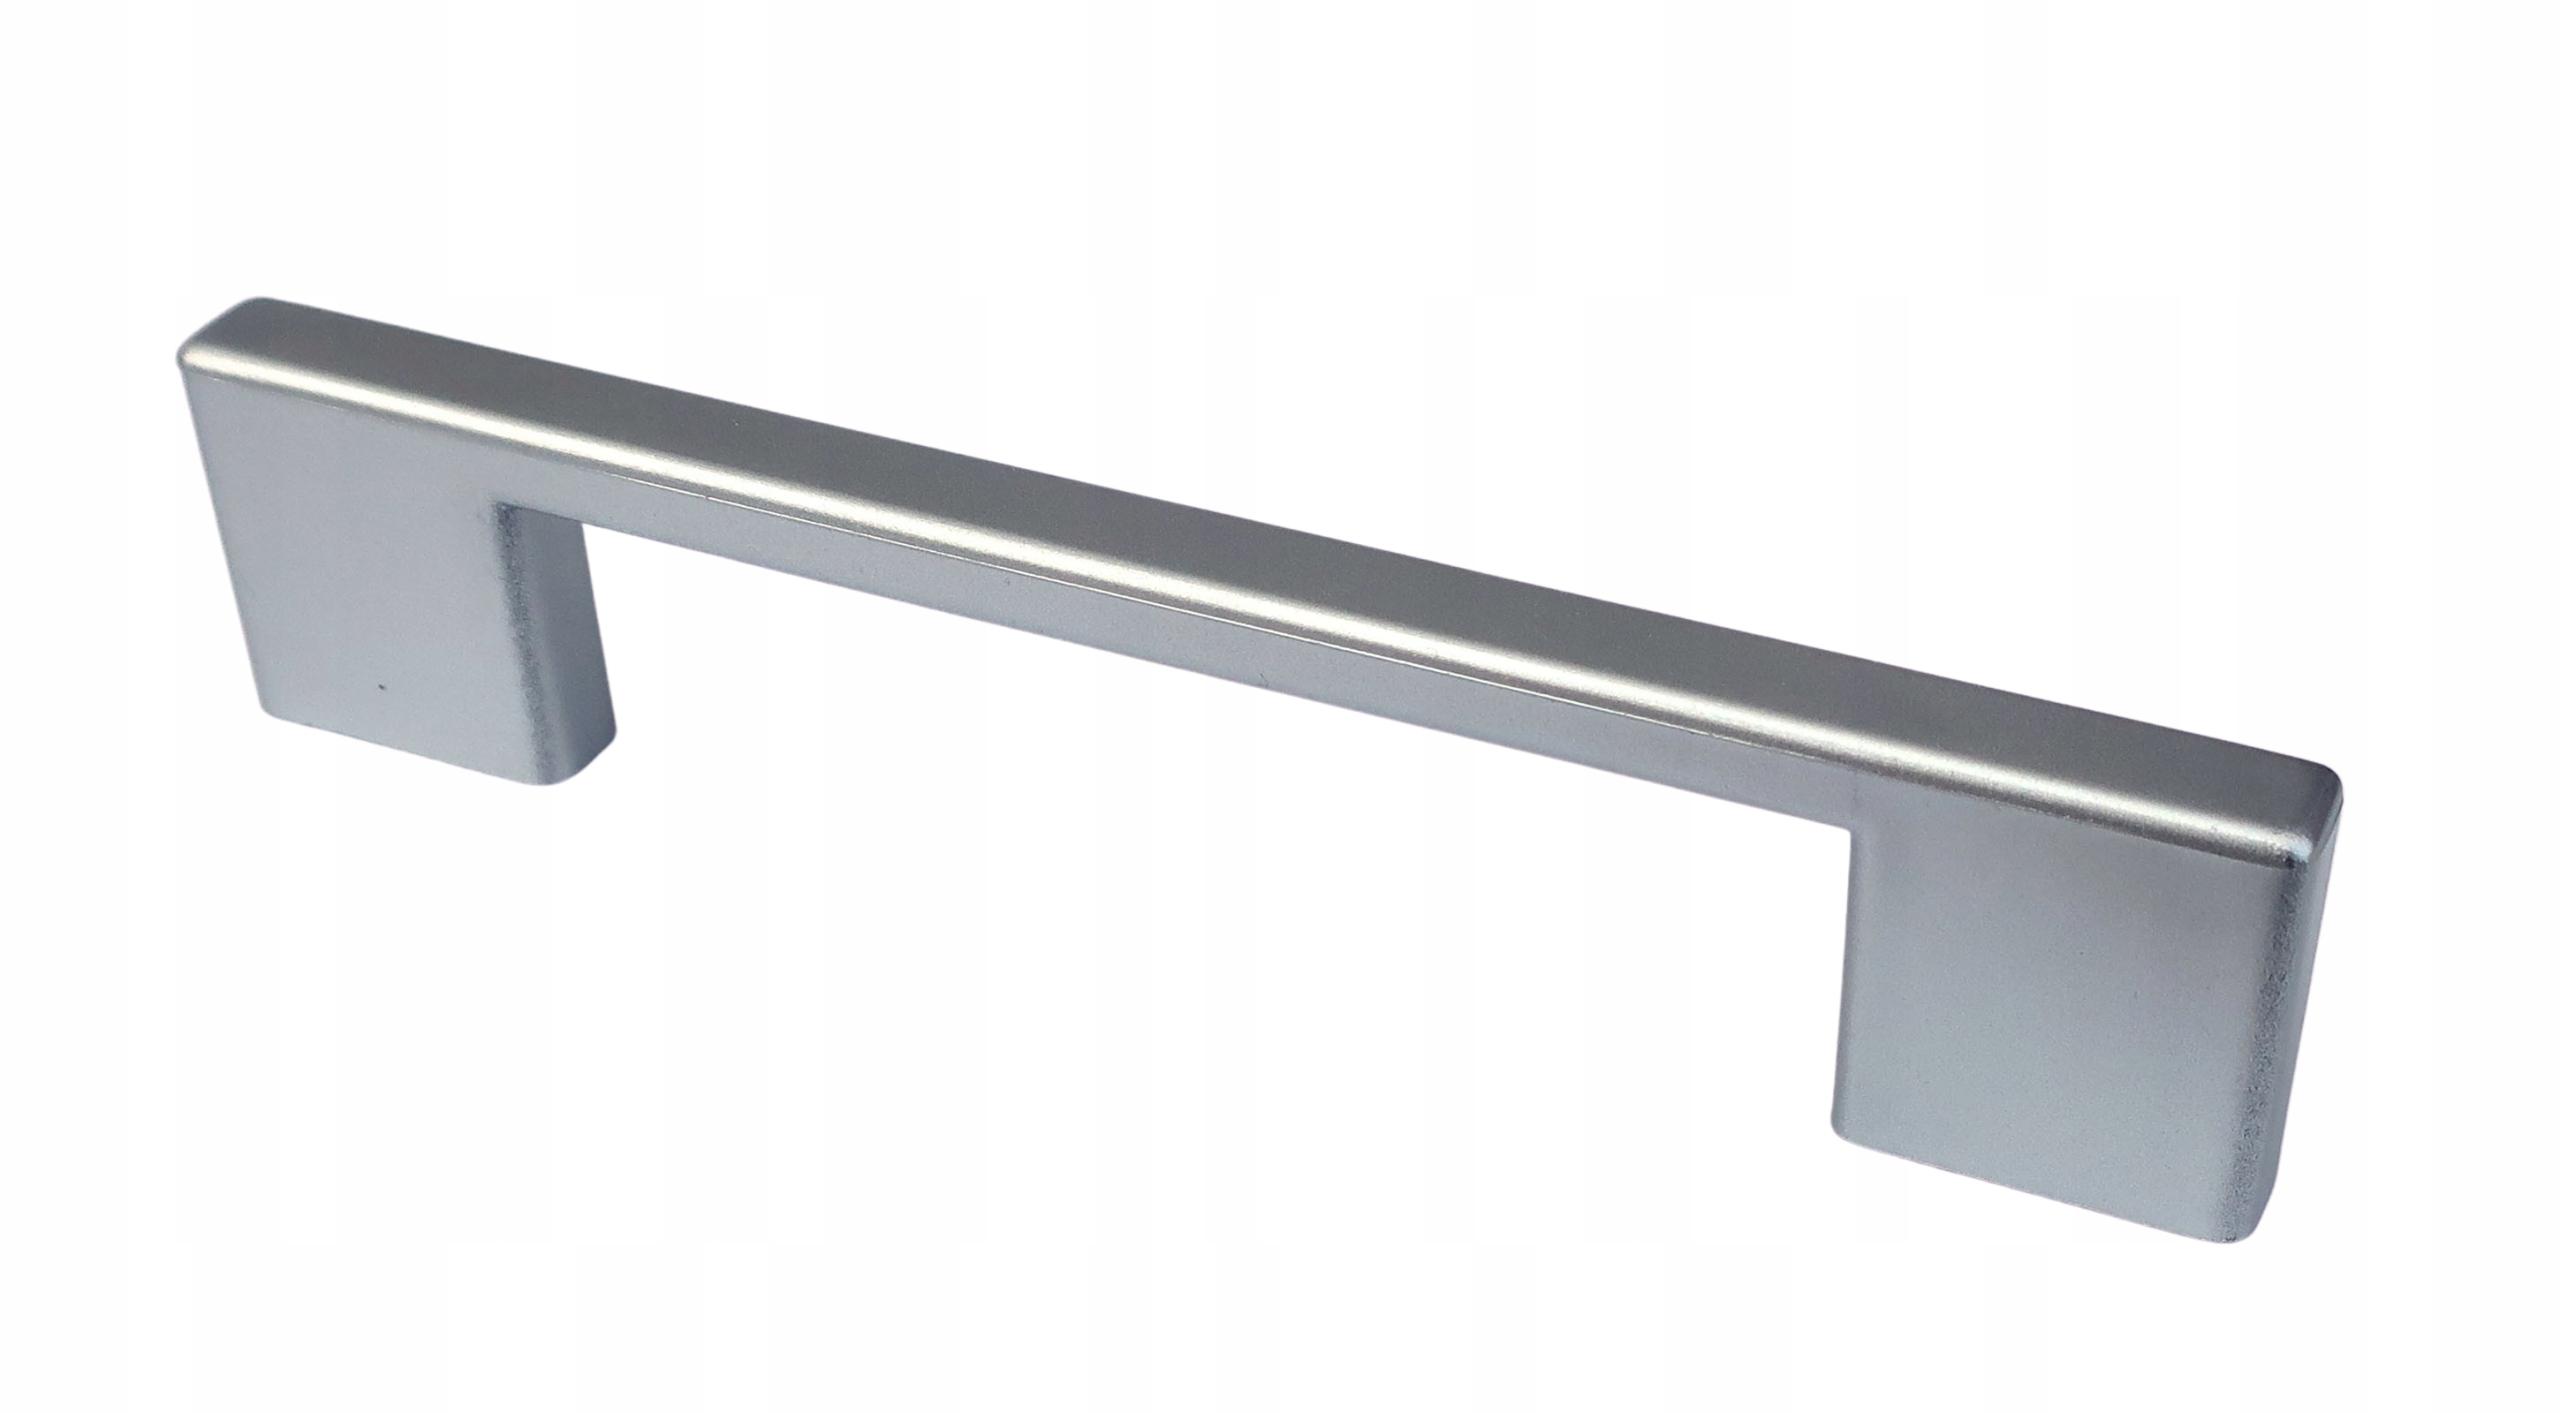 Мебельная ручка UL Silver 96мм 128мм + винты